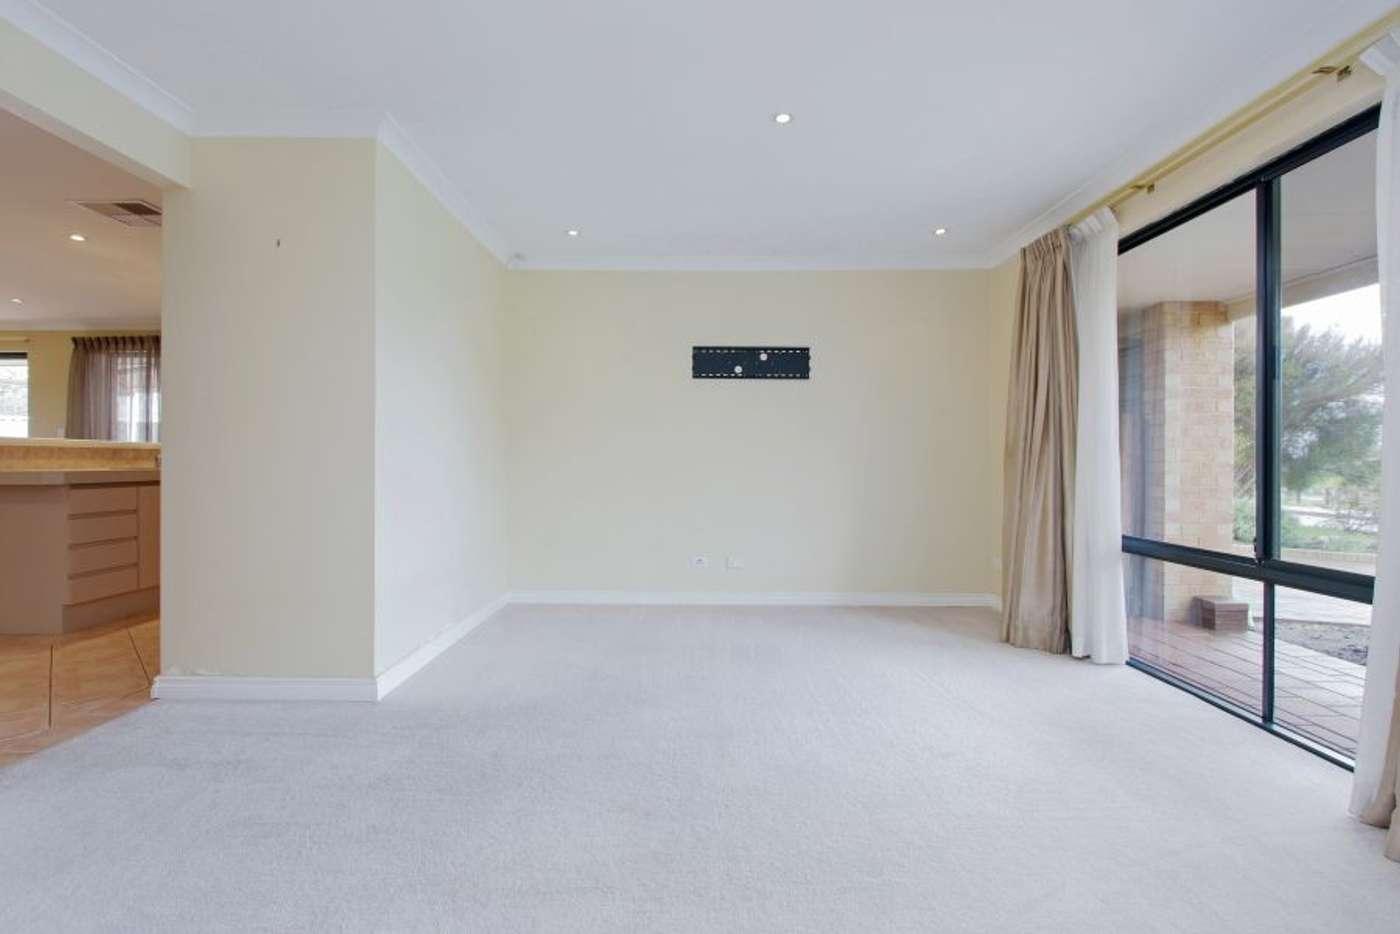 Sixth view of Homely house listing, 43 Coonawarra Drive, Caversham WA 6055